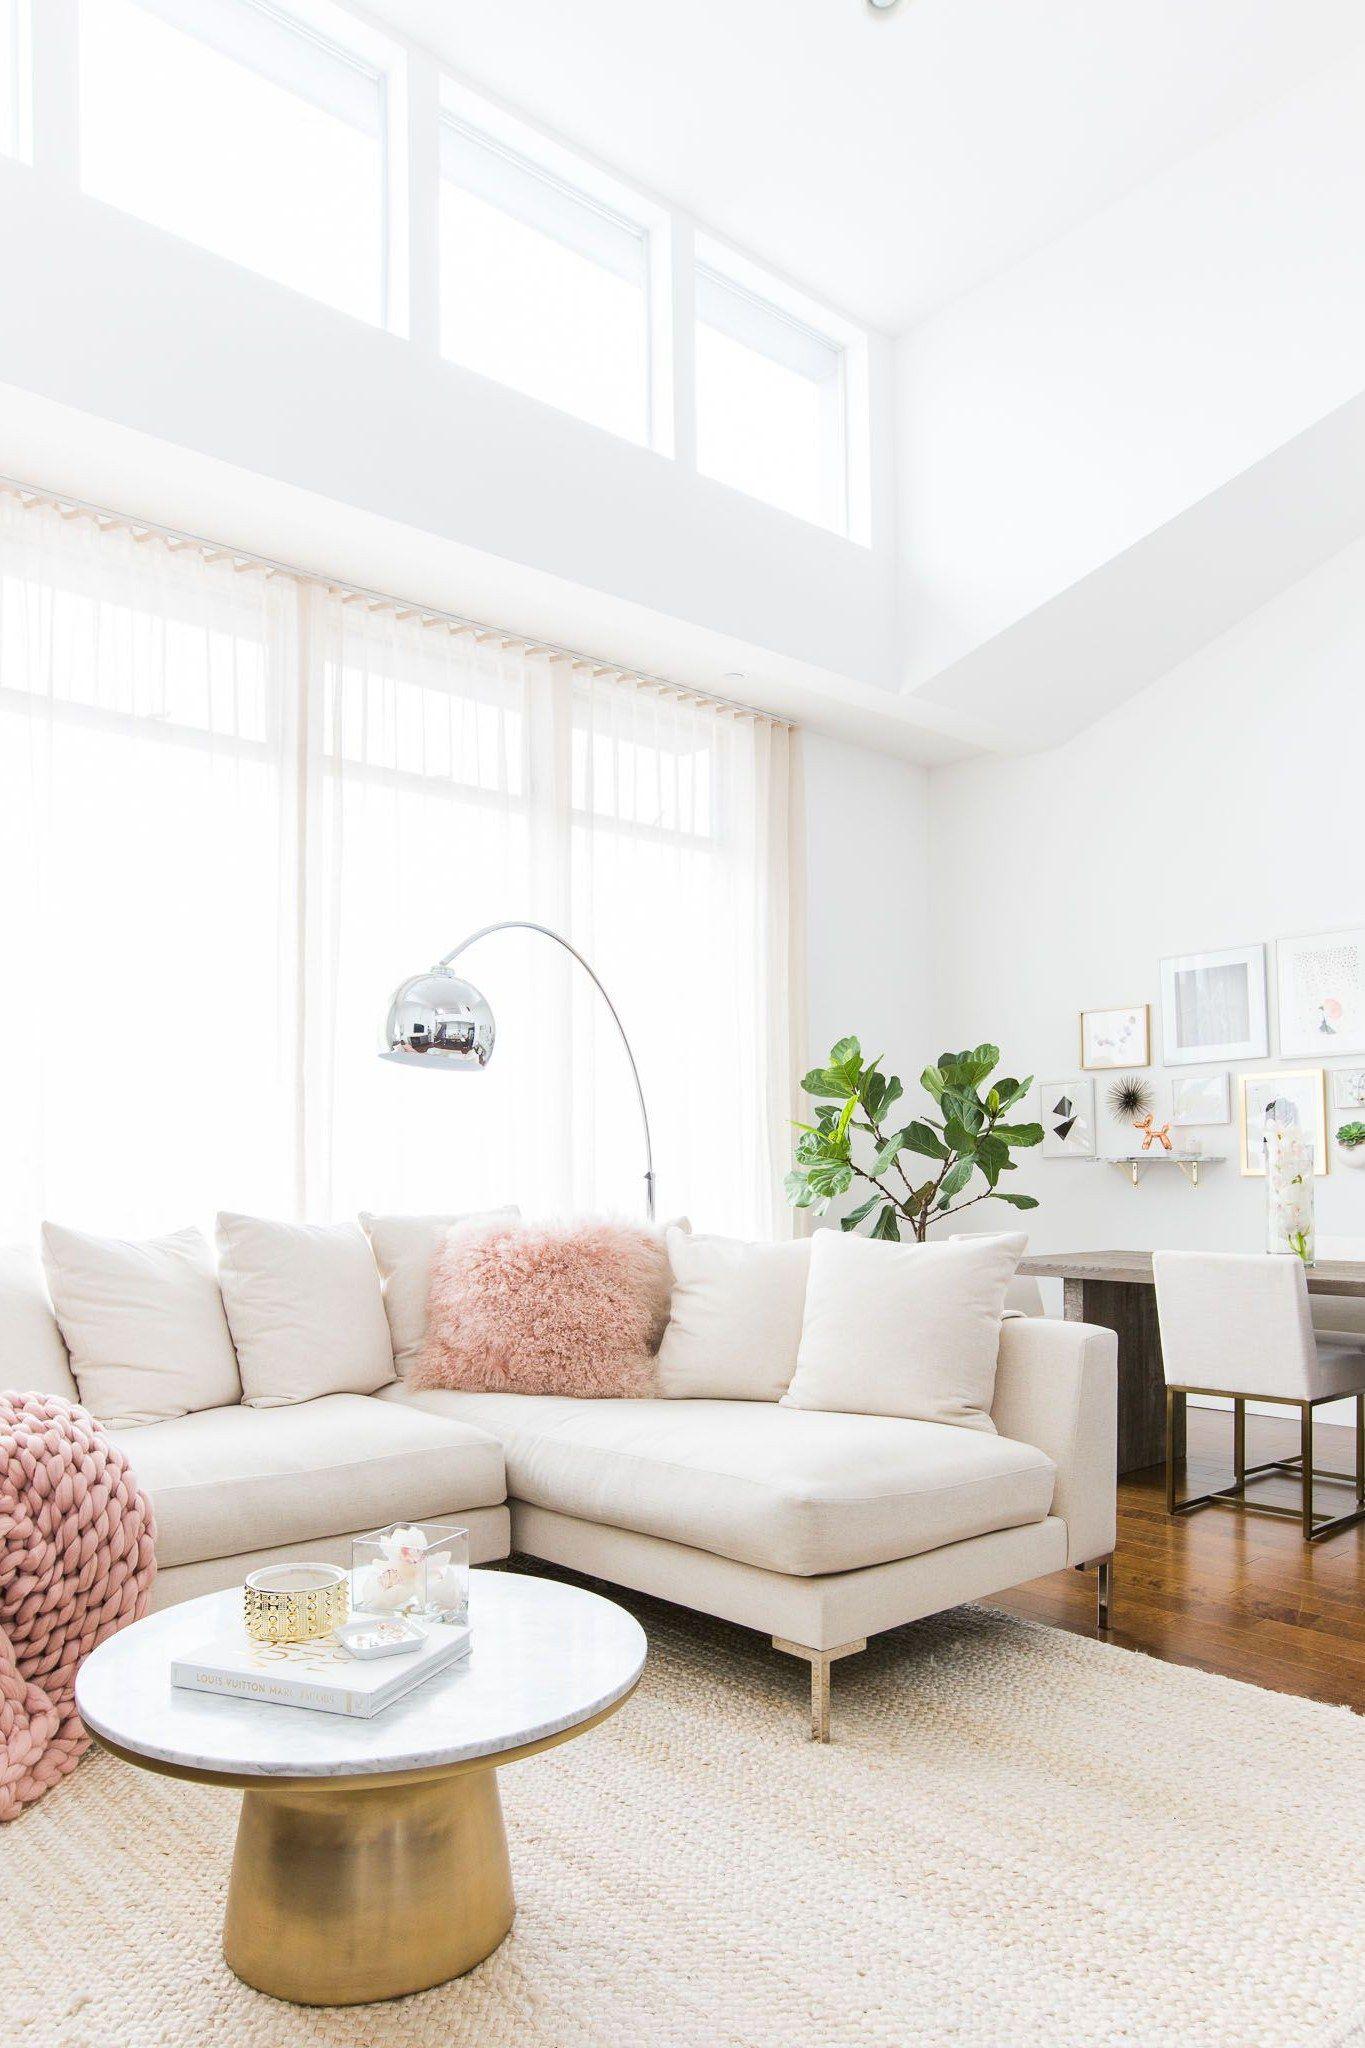 Interior Decorating Ideas | Help Me Design My Living Room | Beautiful Living Room Interiors 20181013 & Interior Decorating Ideas | Help Me Design My Living Room ...